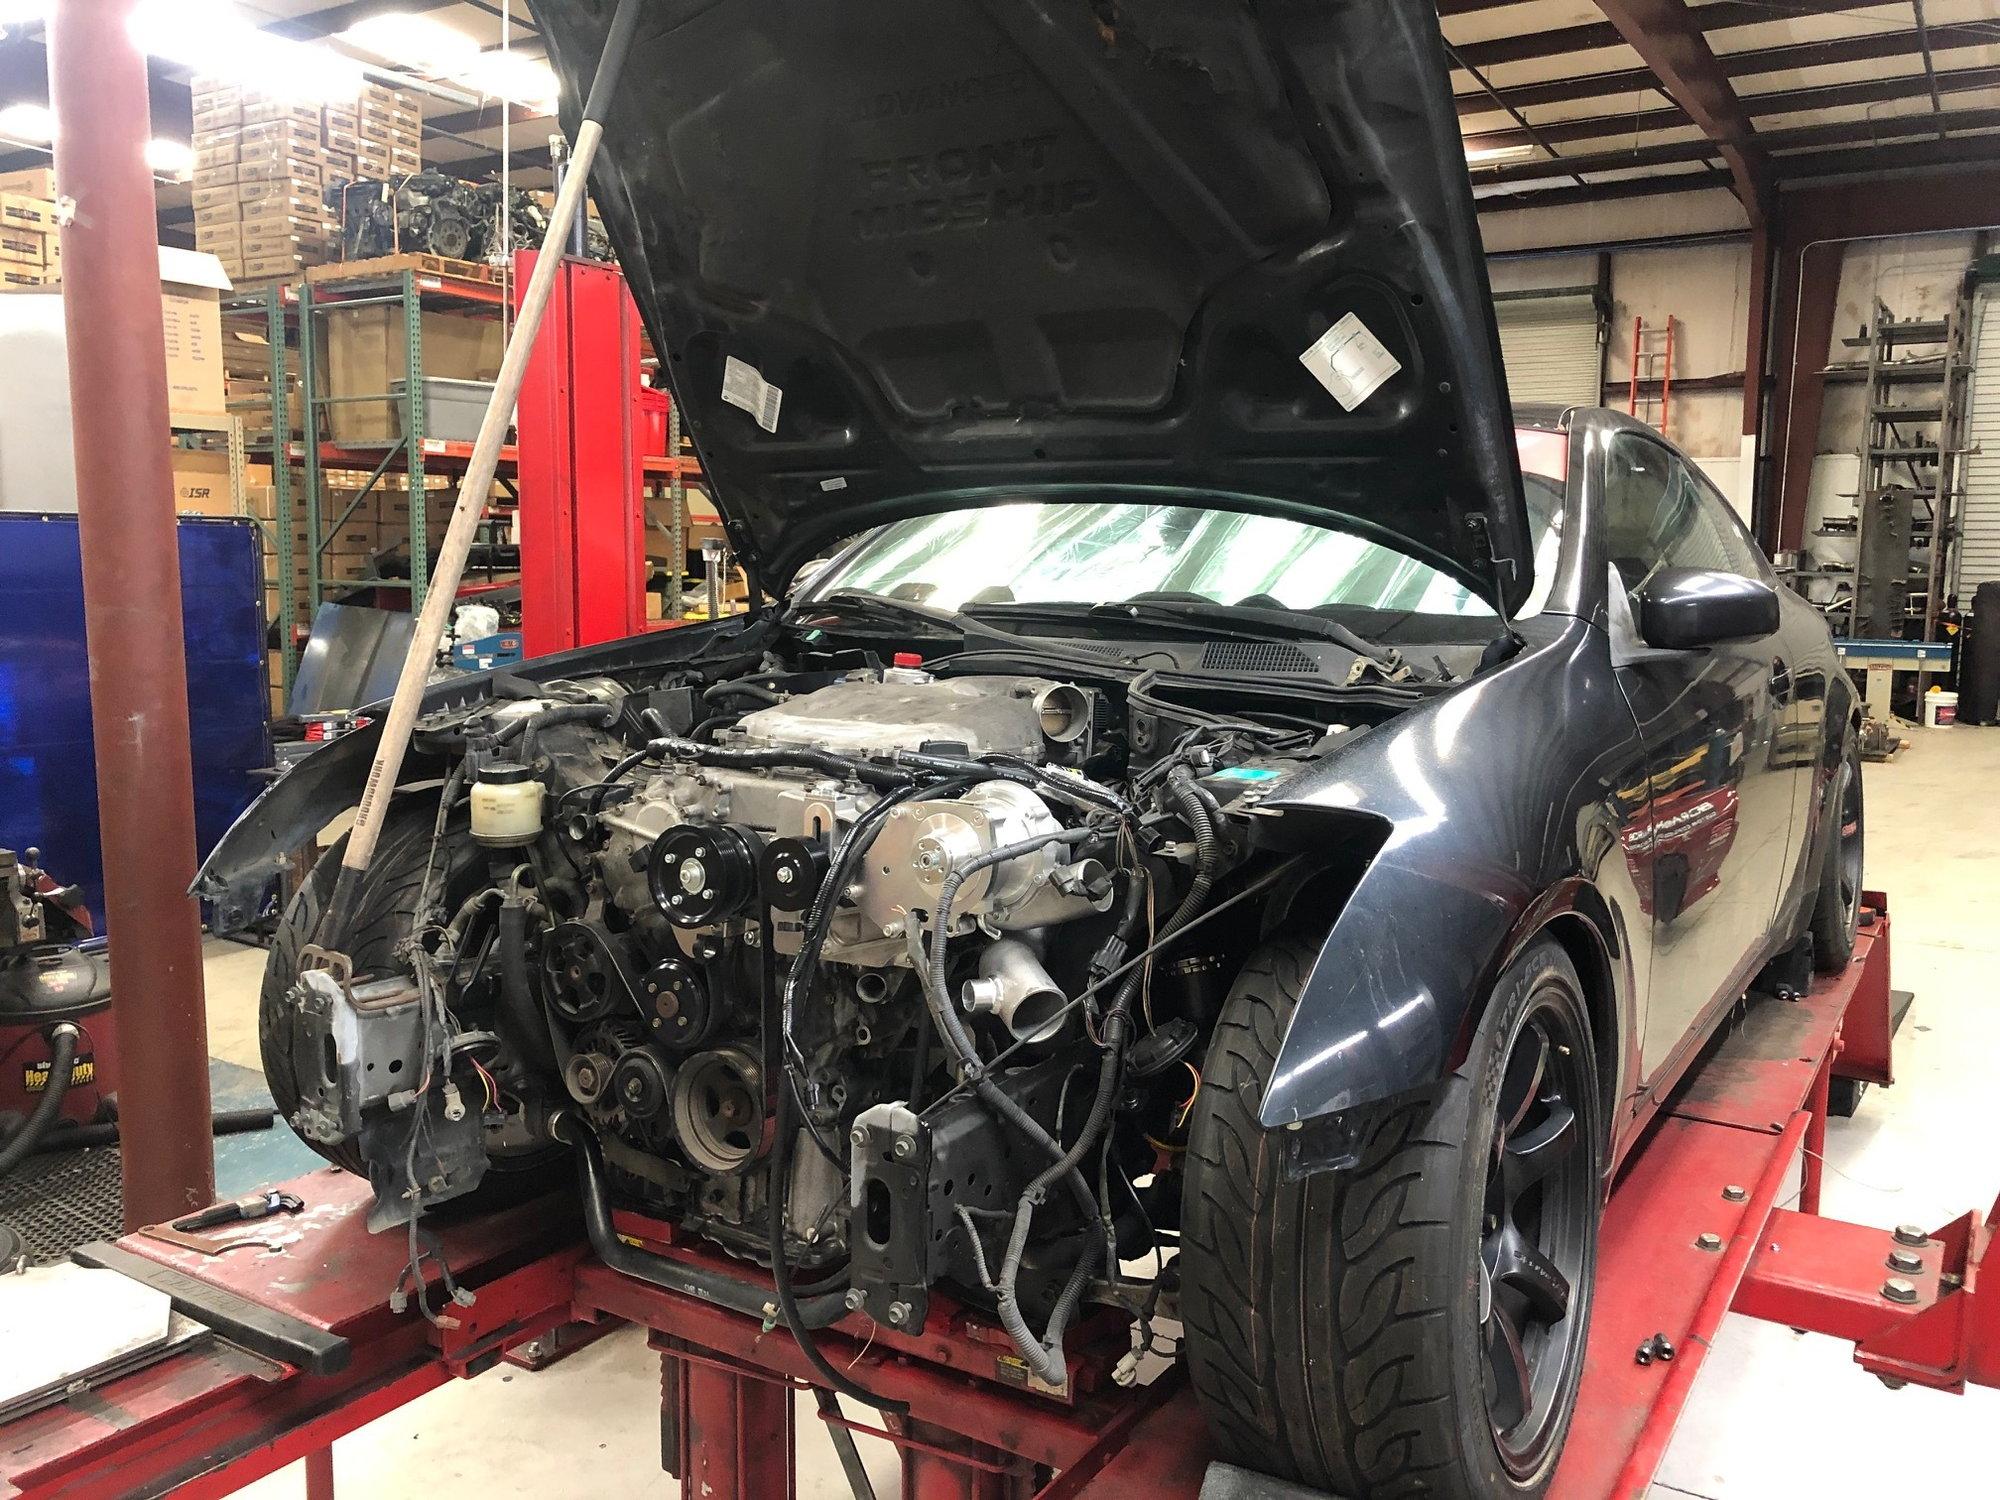 HKS GTS8555 Supercharger? - Page 4 - MY350Z COM - Nissan